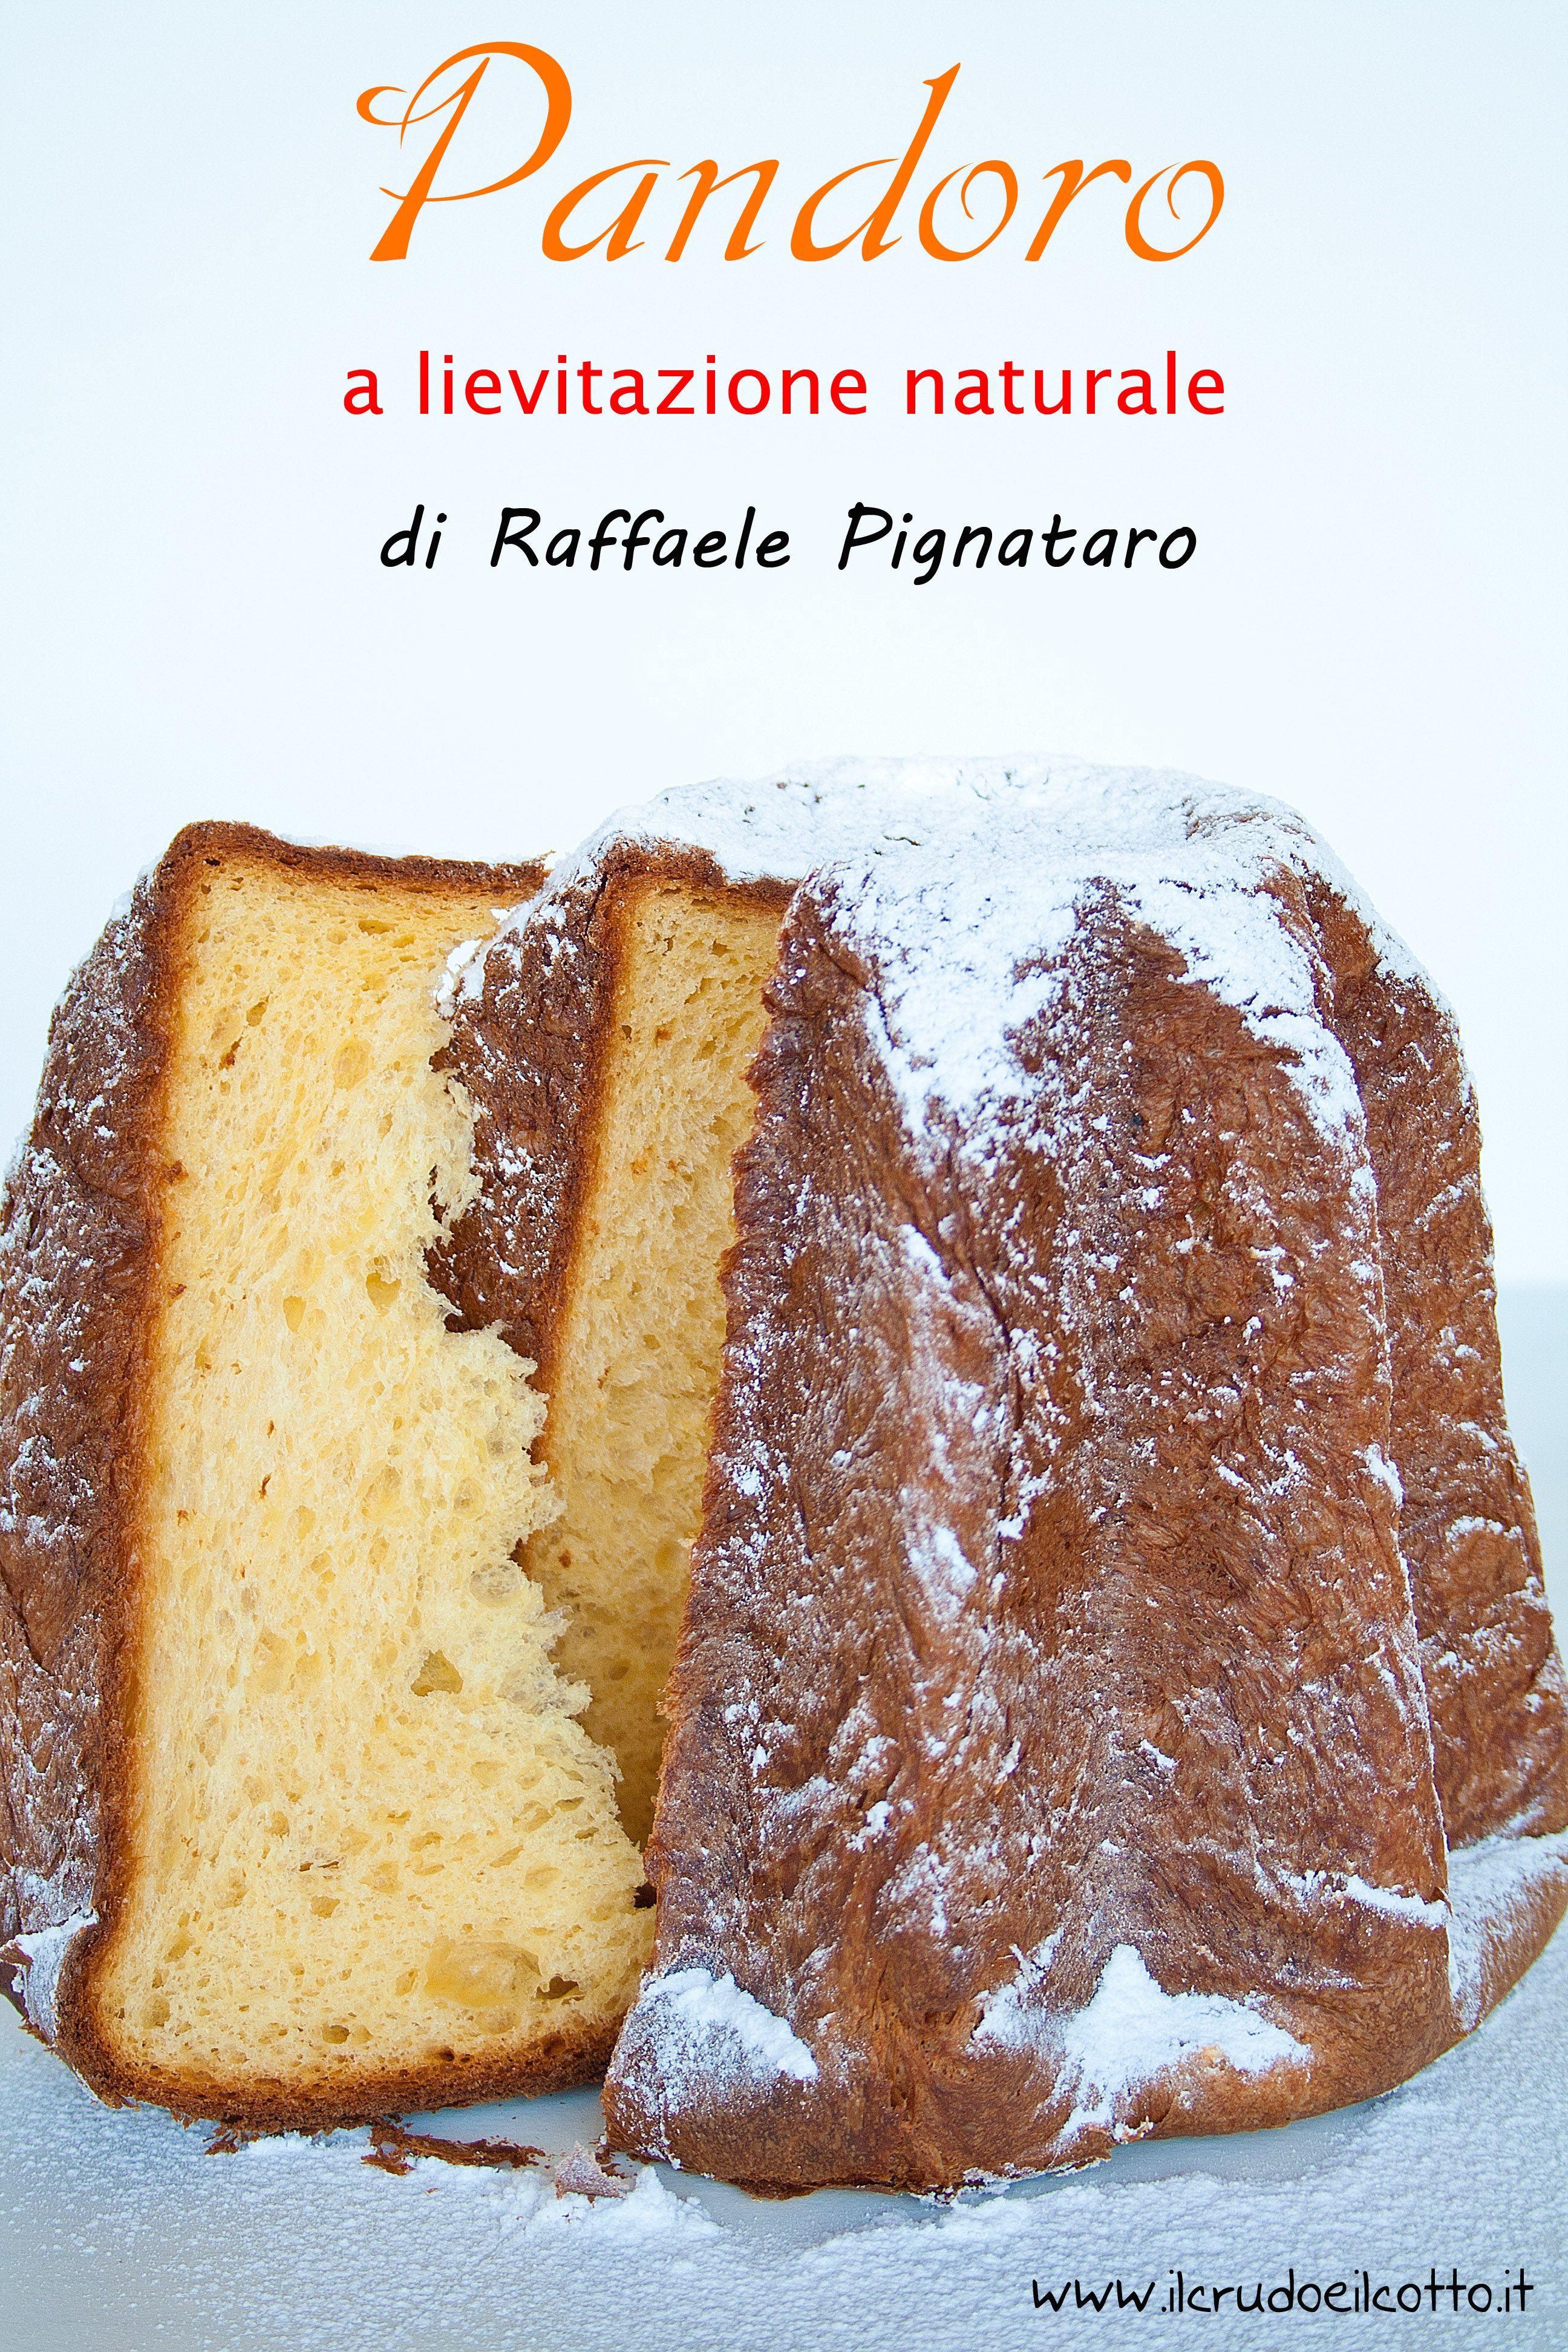 Pandoro Ricetta Raffaele Pignataro Lievito Madre Pinterest